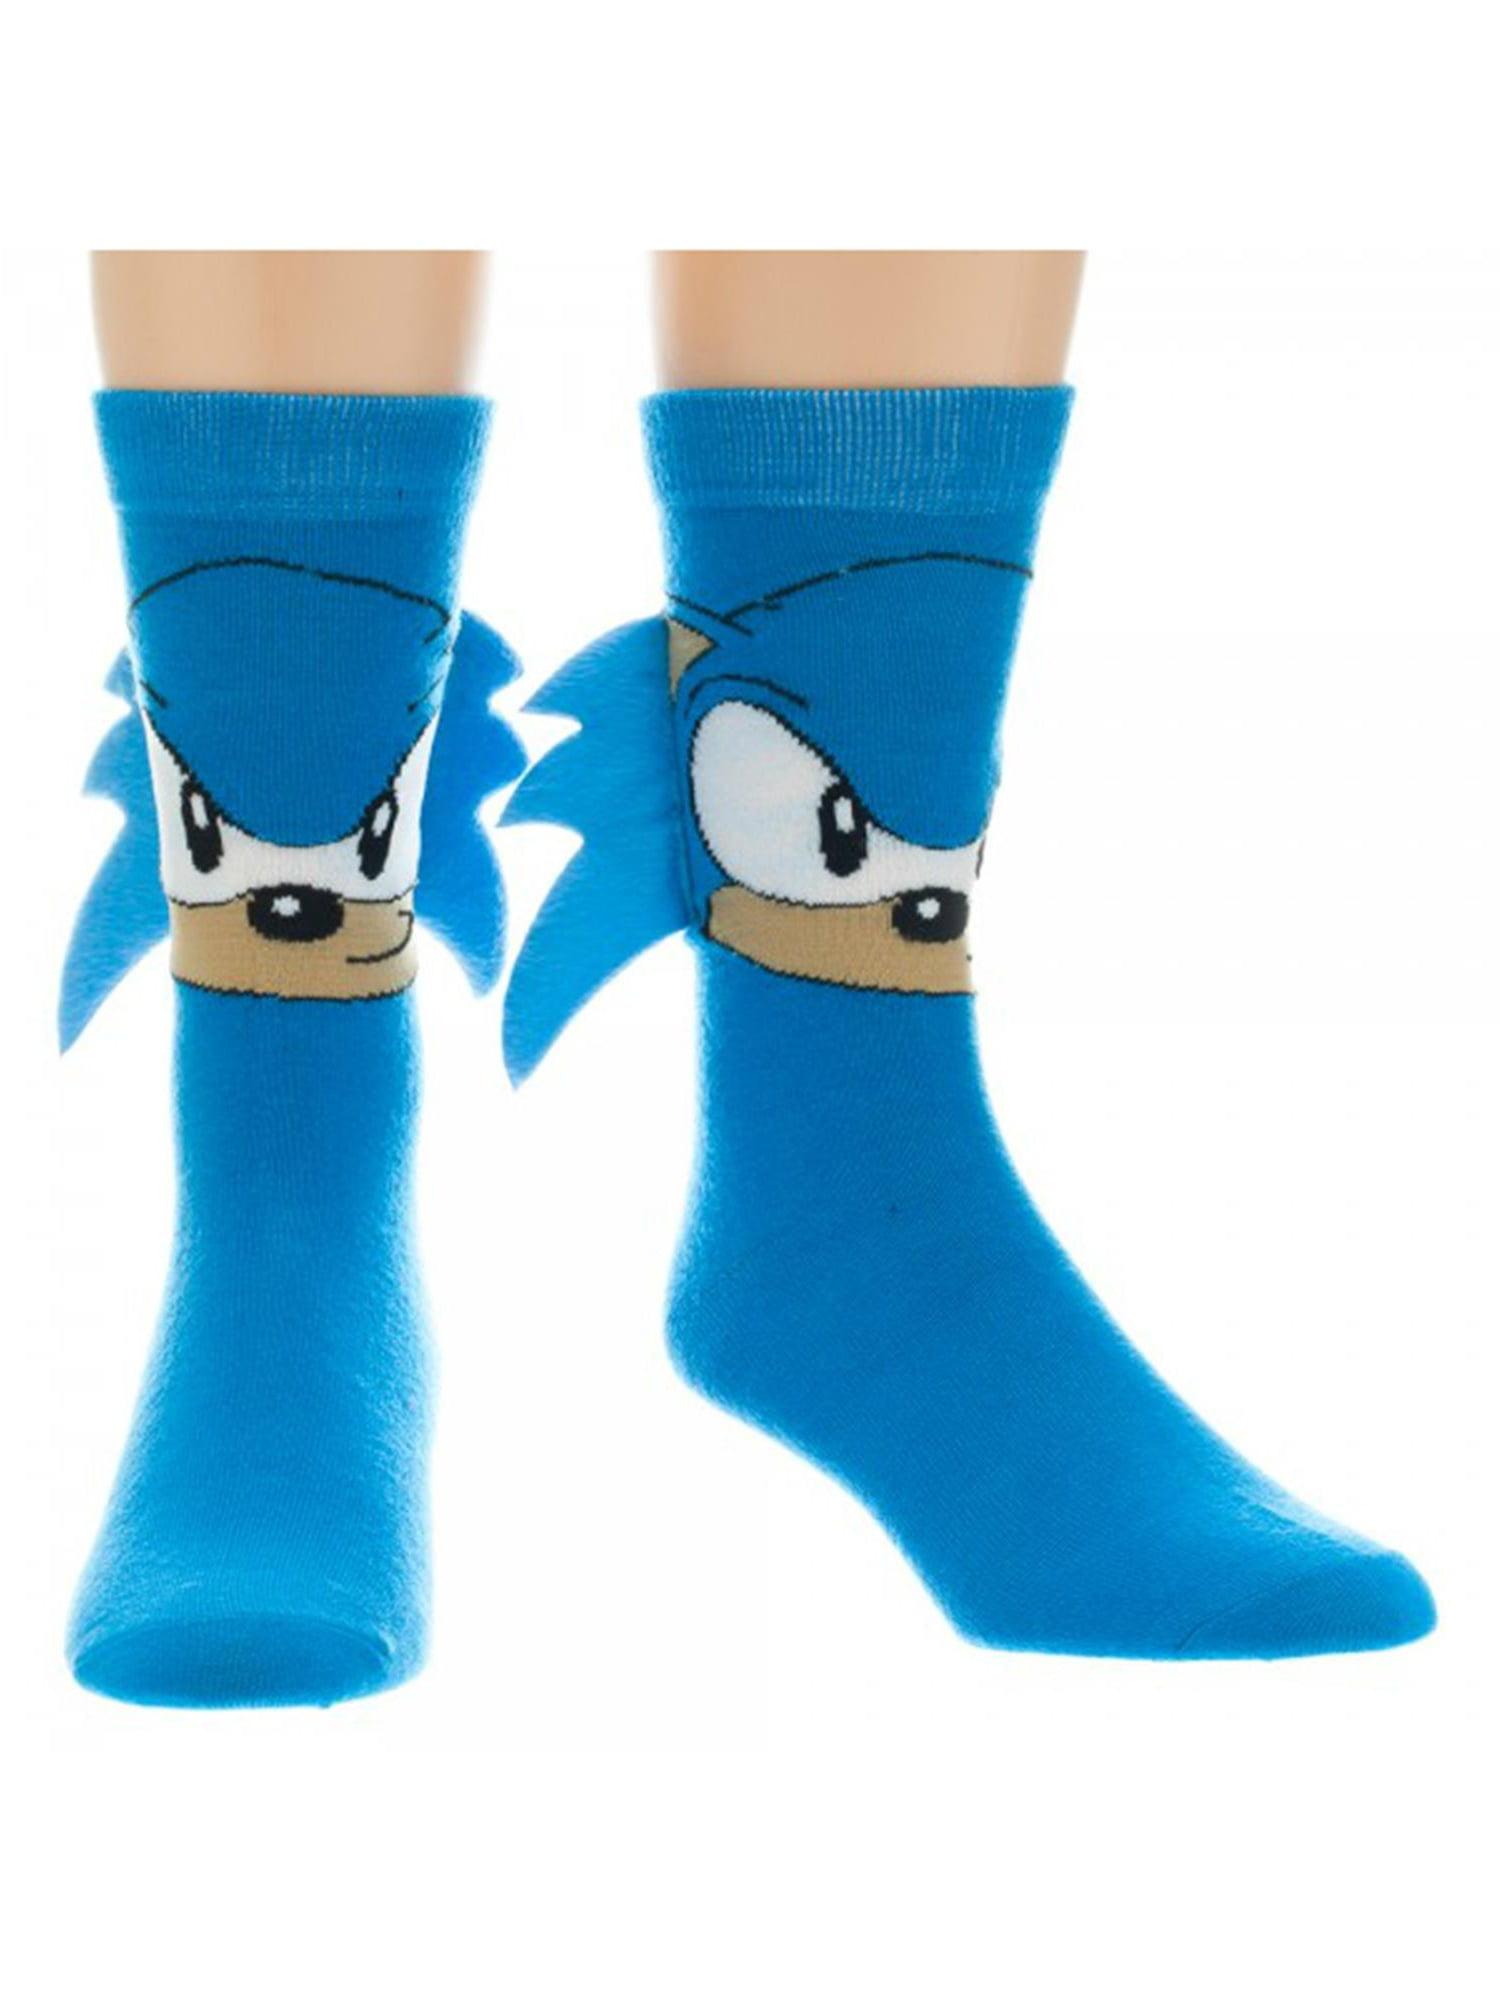 Hedgehog Unisex Funny Casual Crew Socks Athletic Socks For Boys Girls Kids Teenagers